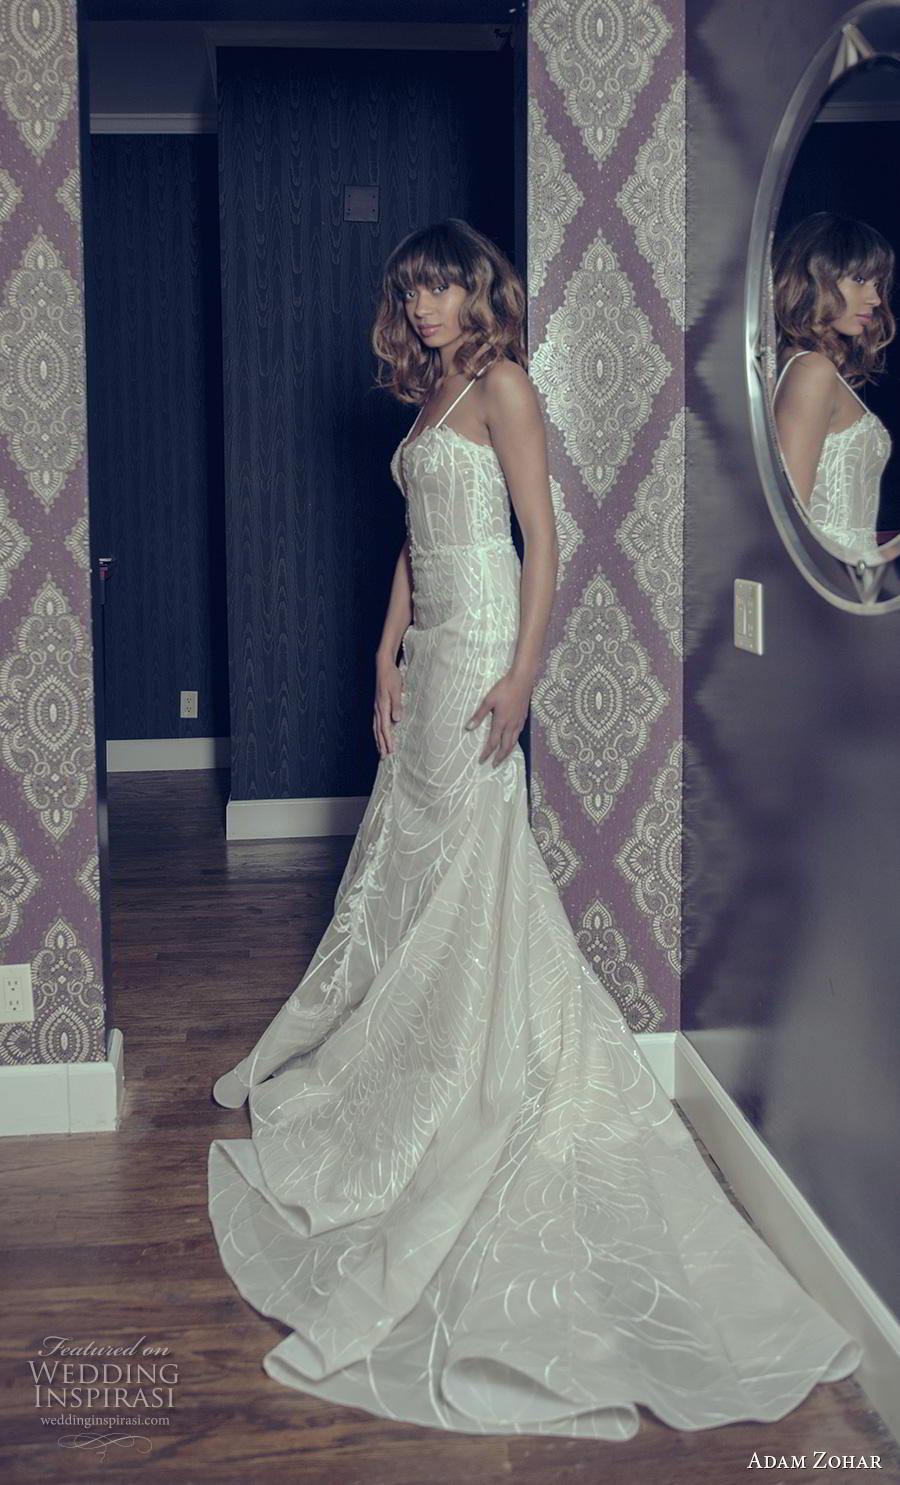 adam zohar 2019 bridal spaghetti strap deep plunging sweetheart neckline full embellishment sexy glamorous fit and flare wedding dress chapel train (3) sdv